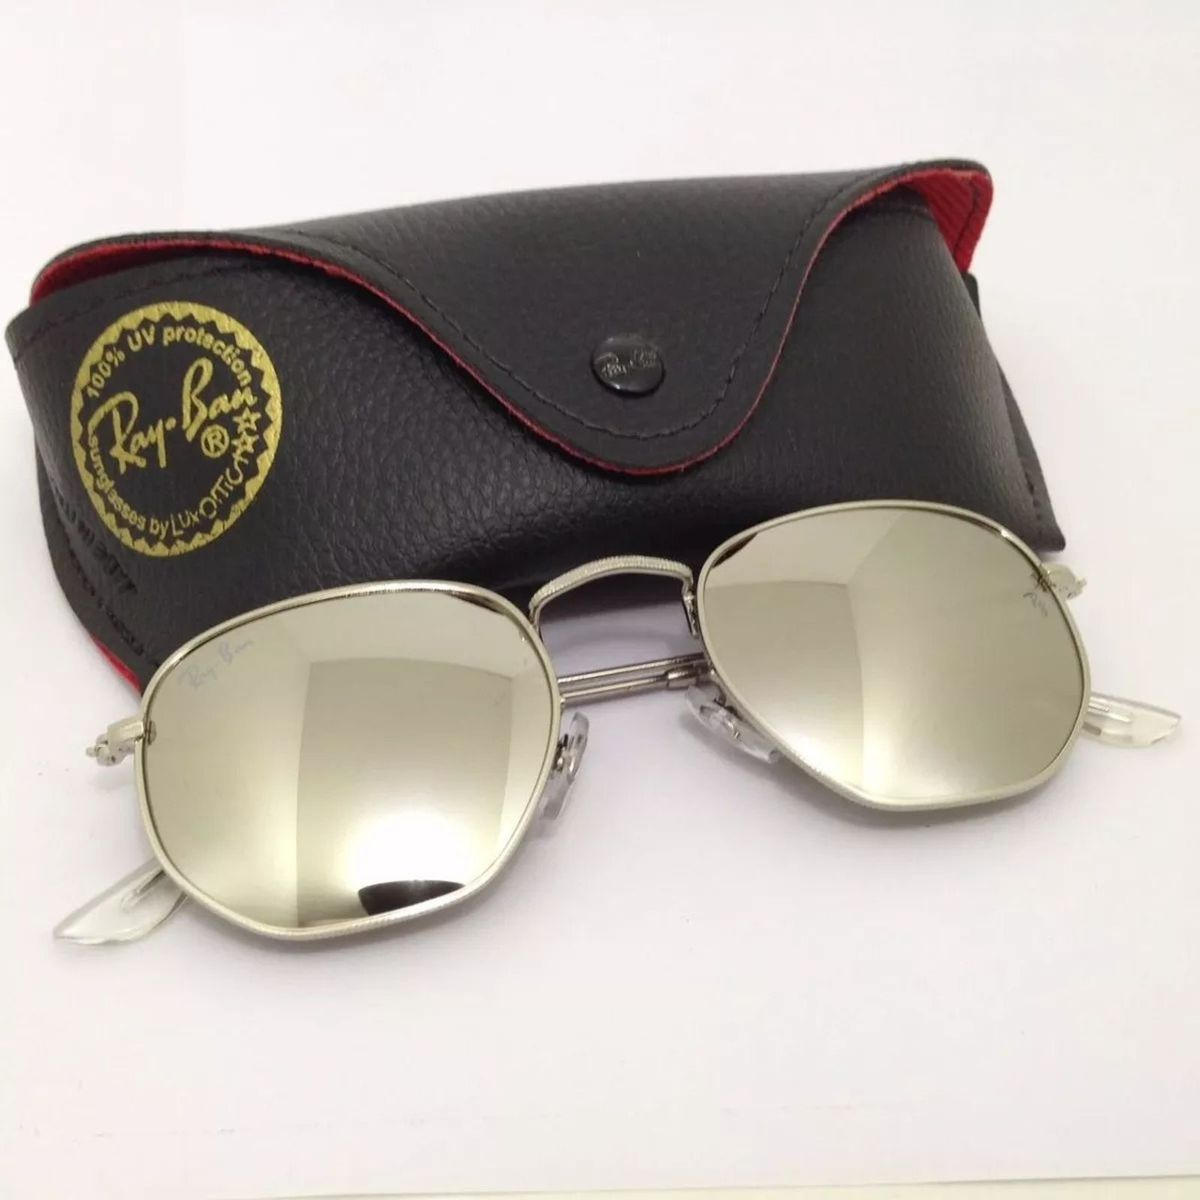 2f034f8ea Óculos de Sol Hexagonal Ray Ban Espelhado Prata Masculino Feminino | Óculos  Feminino Nunca Usado 28405985 | enjoei